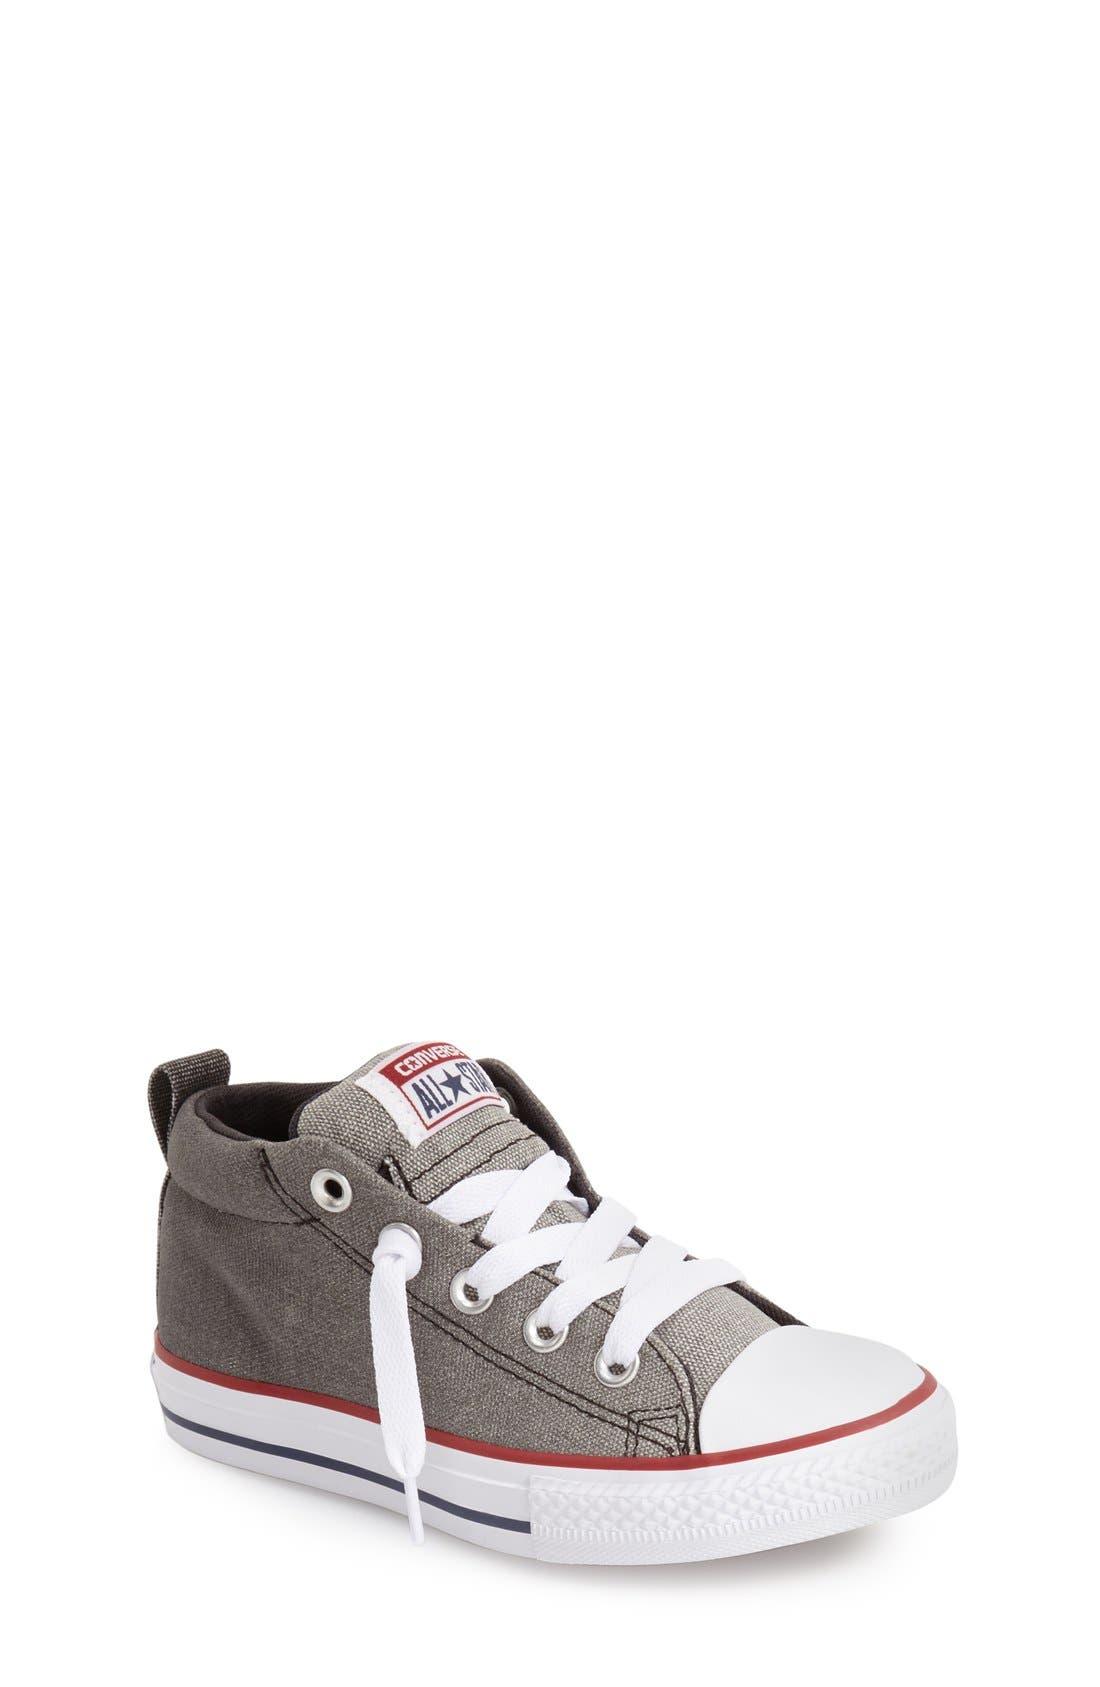 Chuck Taylor<sup>®</sup> All Star<sup>®</sup> 'CTAS Street' Mid Sneaker,                             Main thumbnail 1, color,                             030